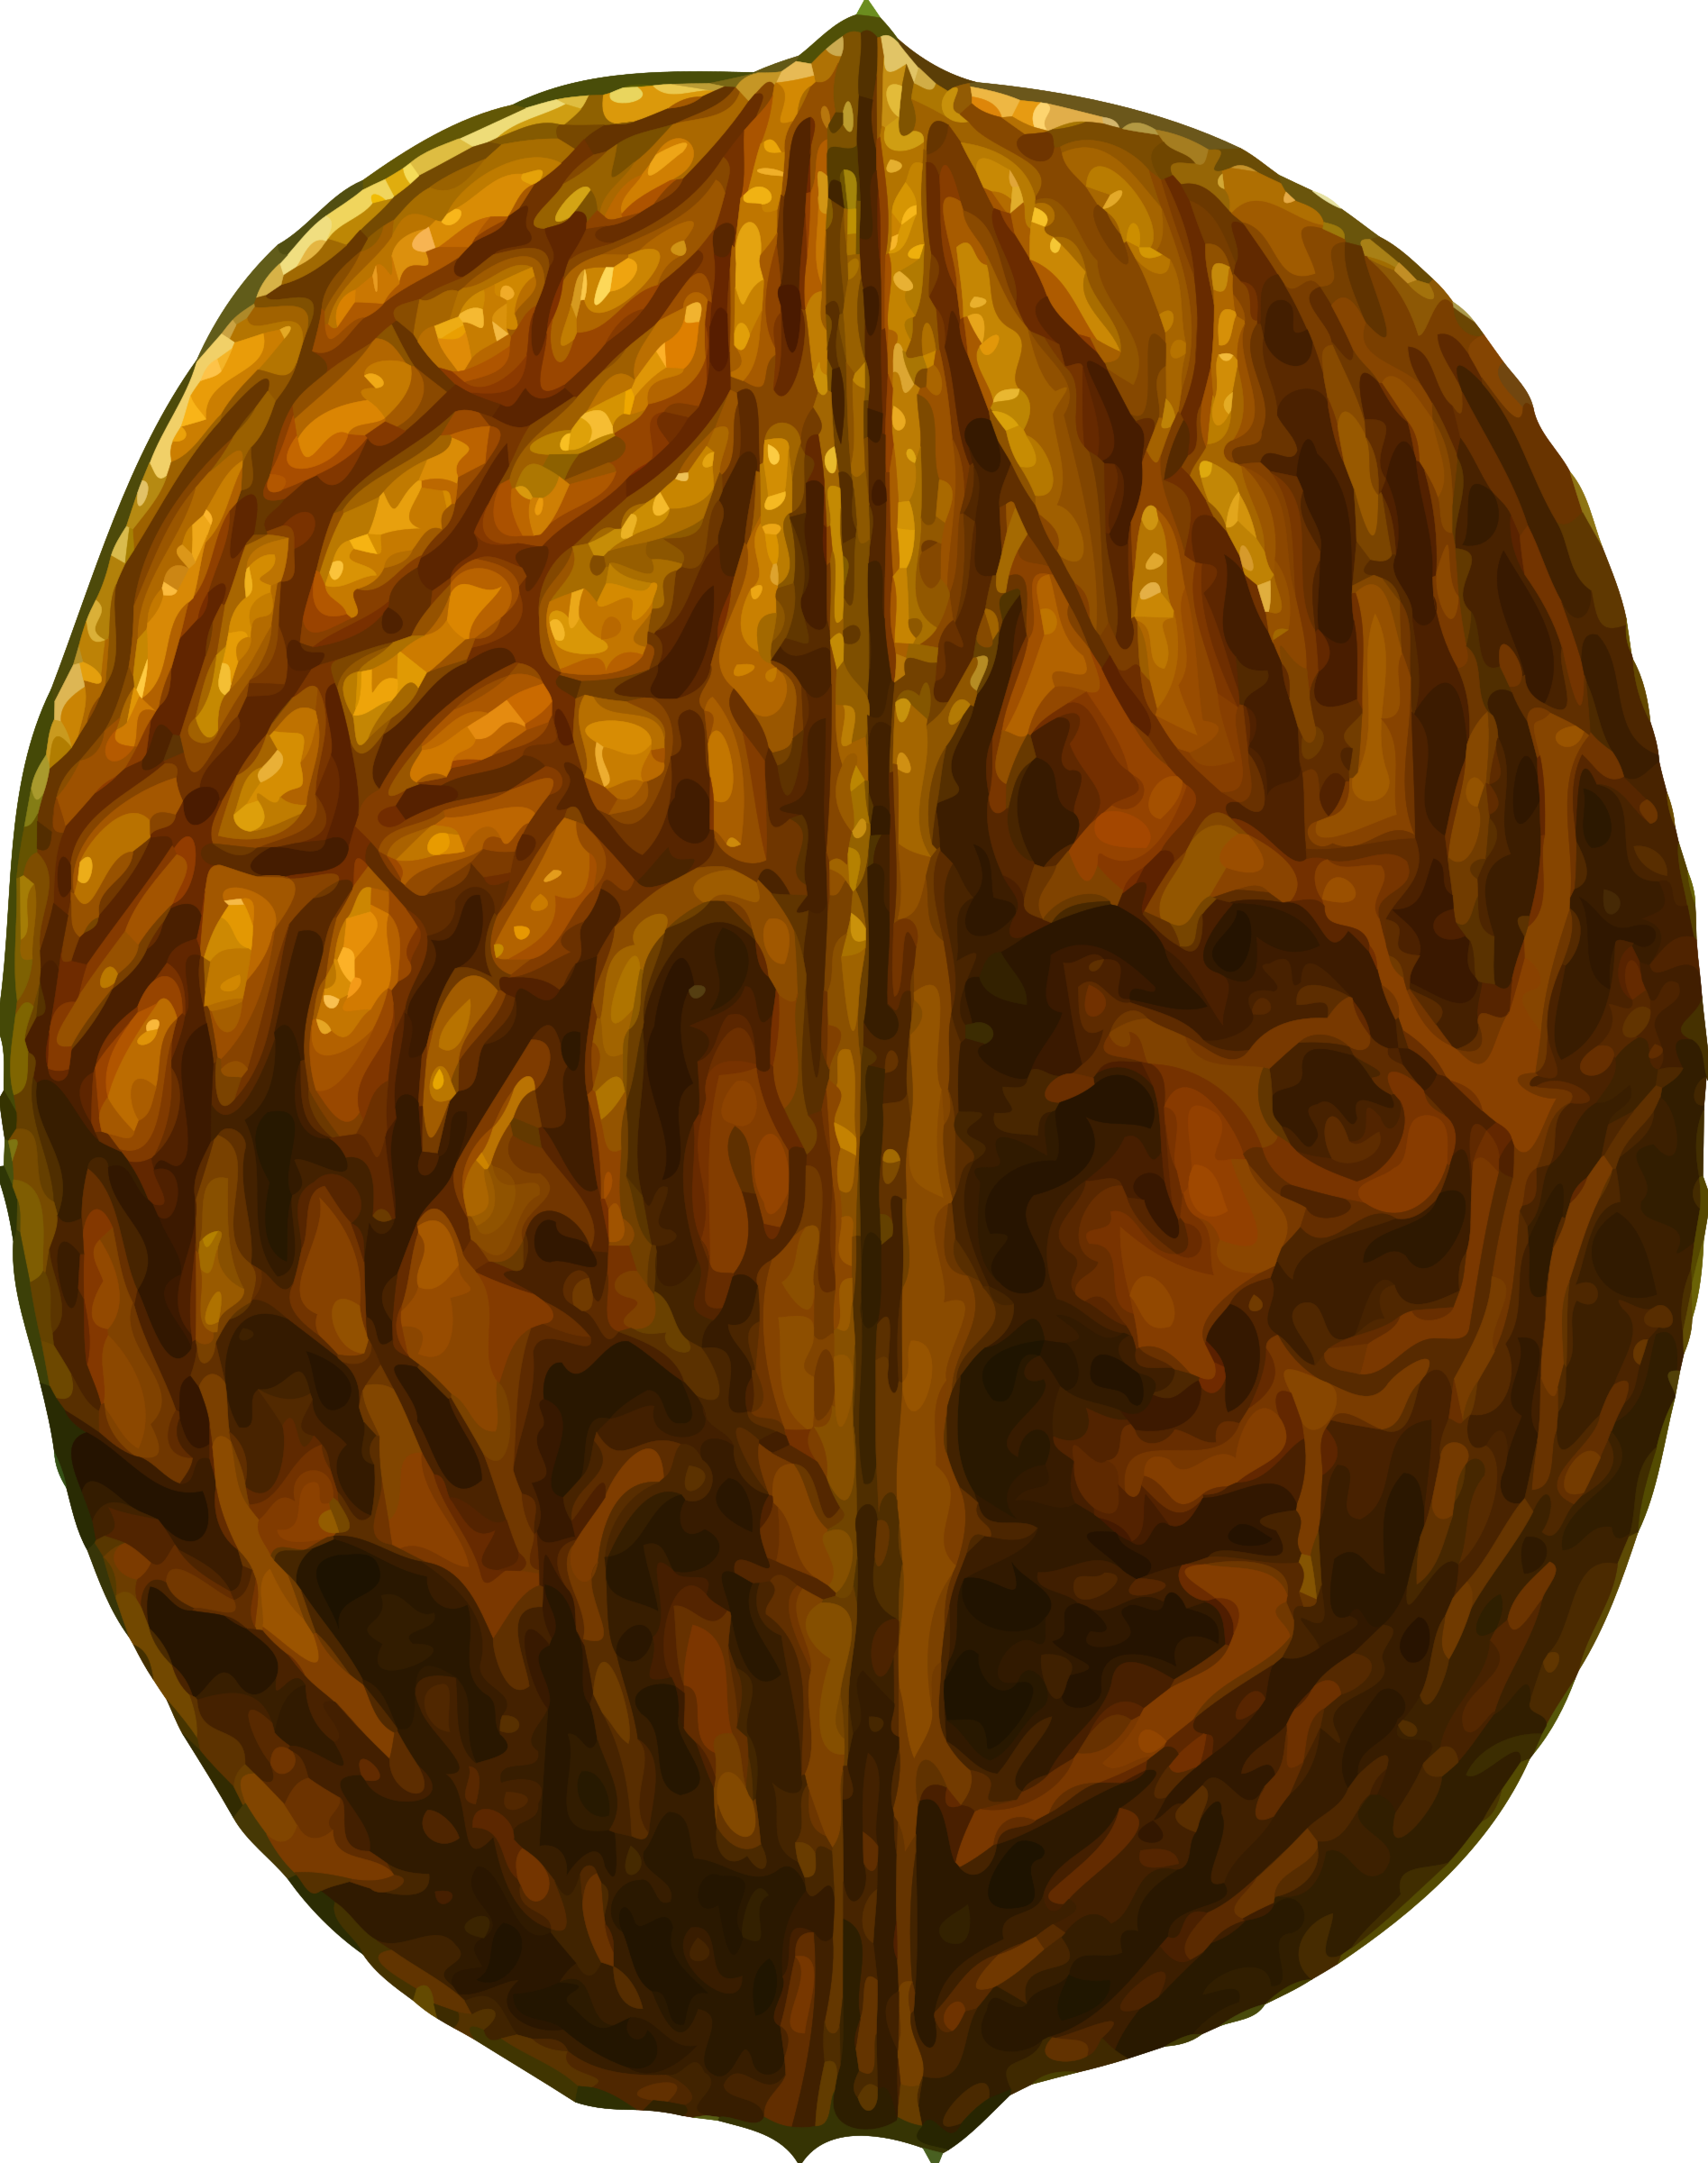 Walnut drawing at getdrawings. Nut clipart pecan nut